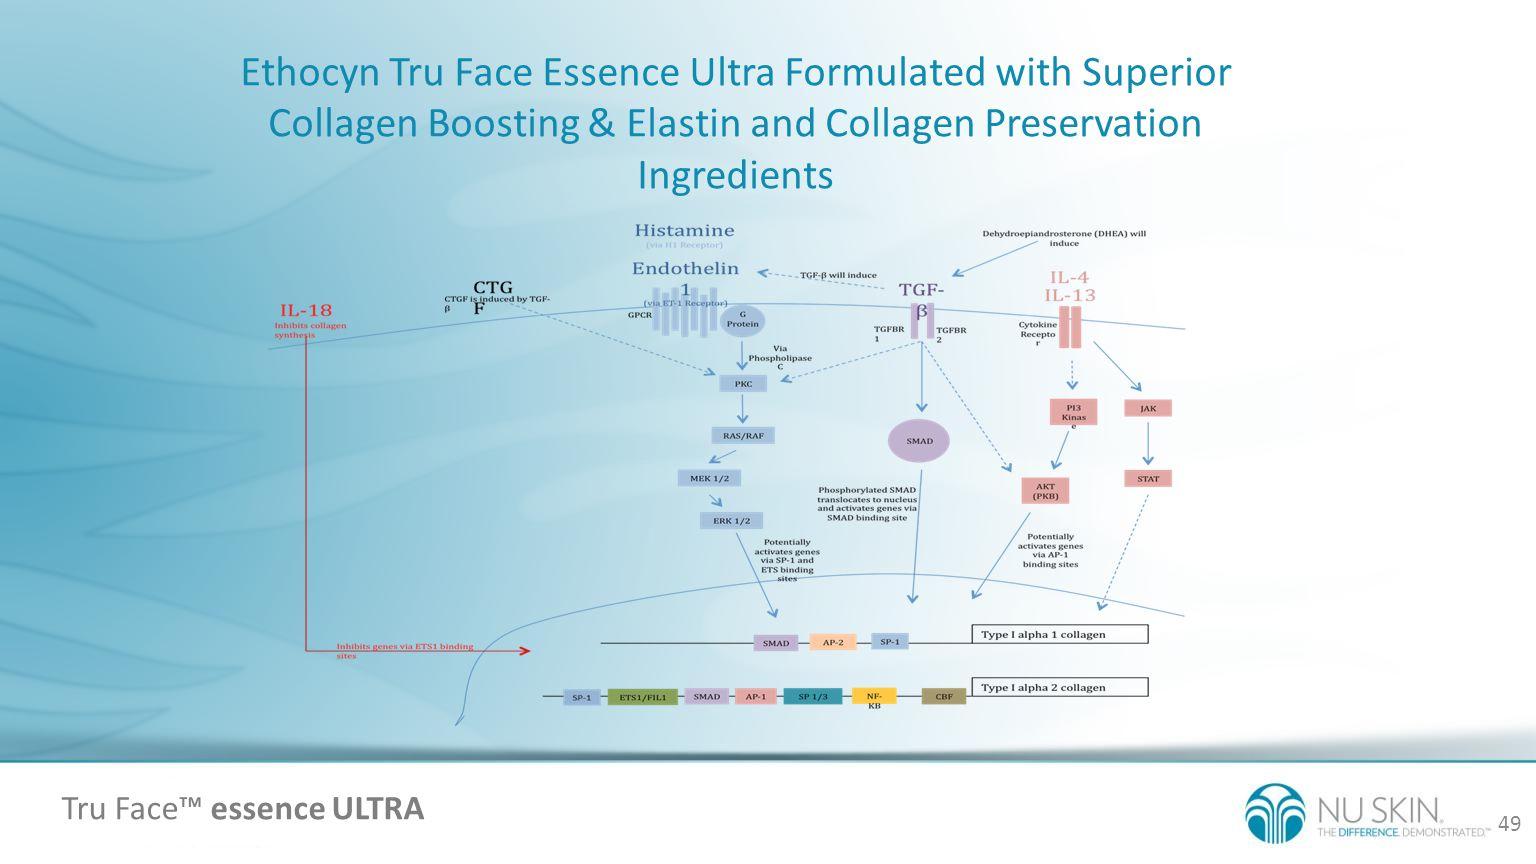 Ethocyn Tru Face Essence Ultra Formulated with Superior Collagen Boosting & Elastin and Collagen Preservation Ingredients 49 Jeffrey D. Hoefflin, M.D.